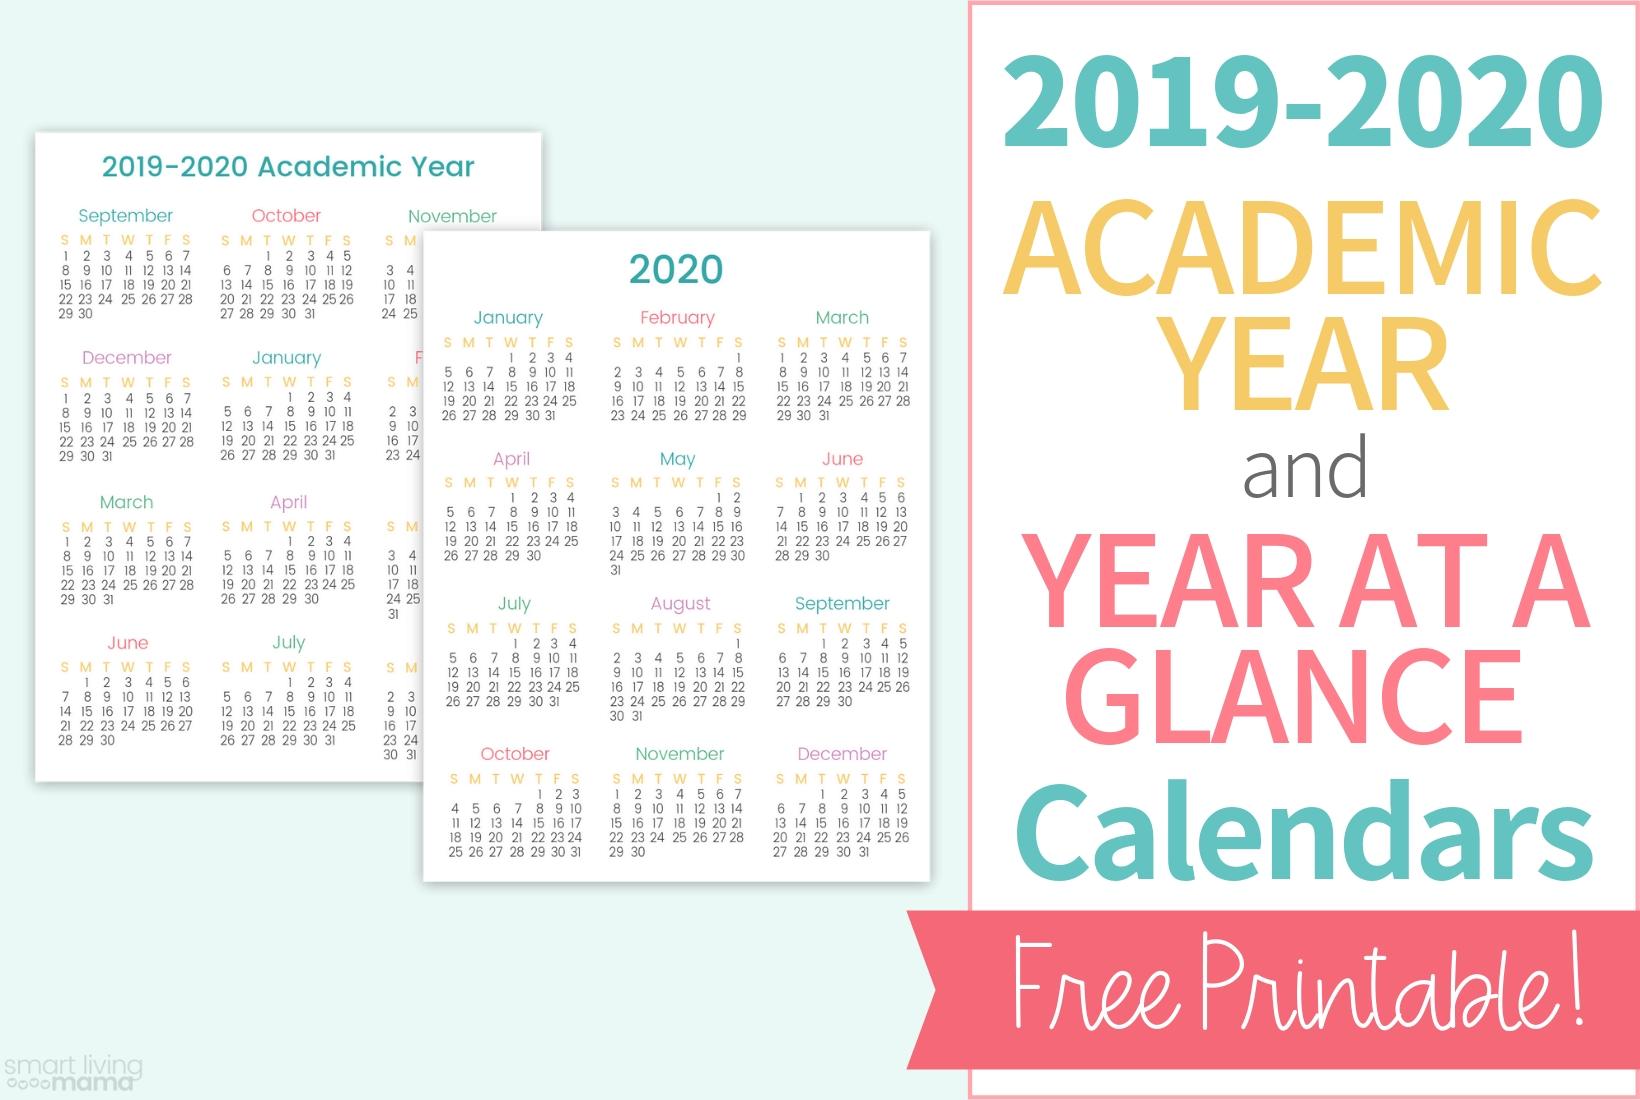 Colorful Printable Calendars For 2019-2020 | Smart Living Mama inside Year Ata Glance 2020 Calendar